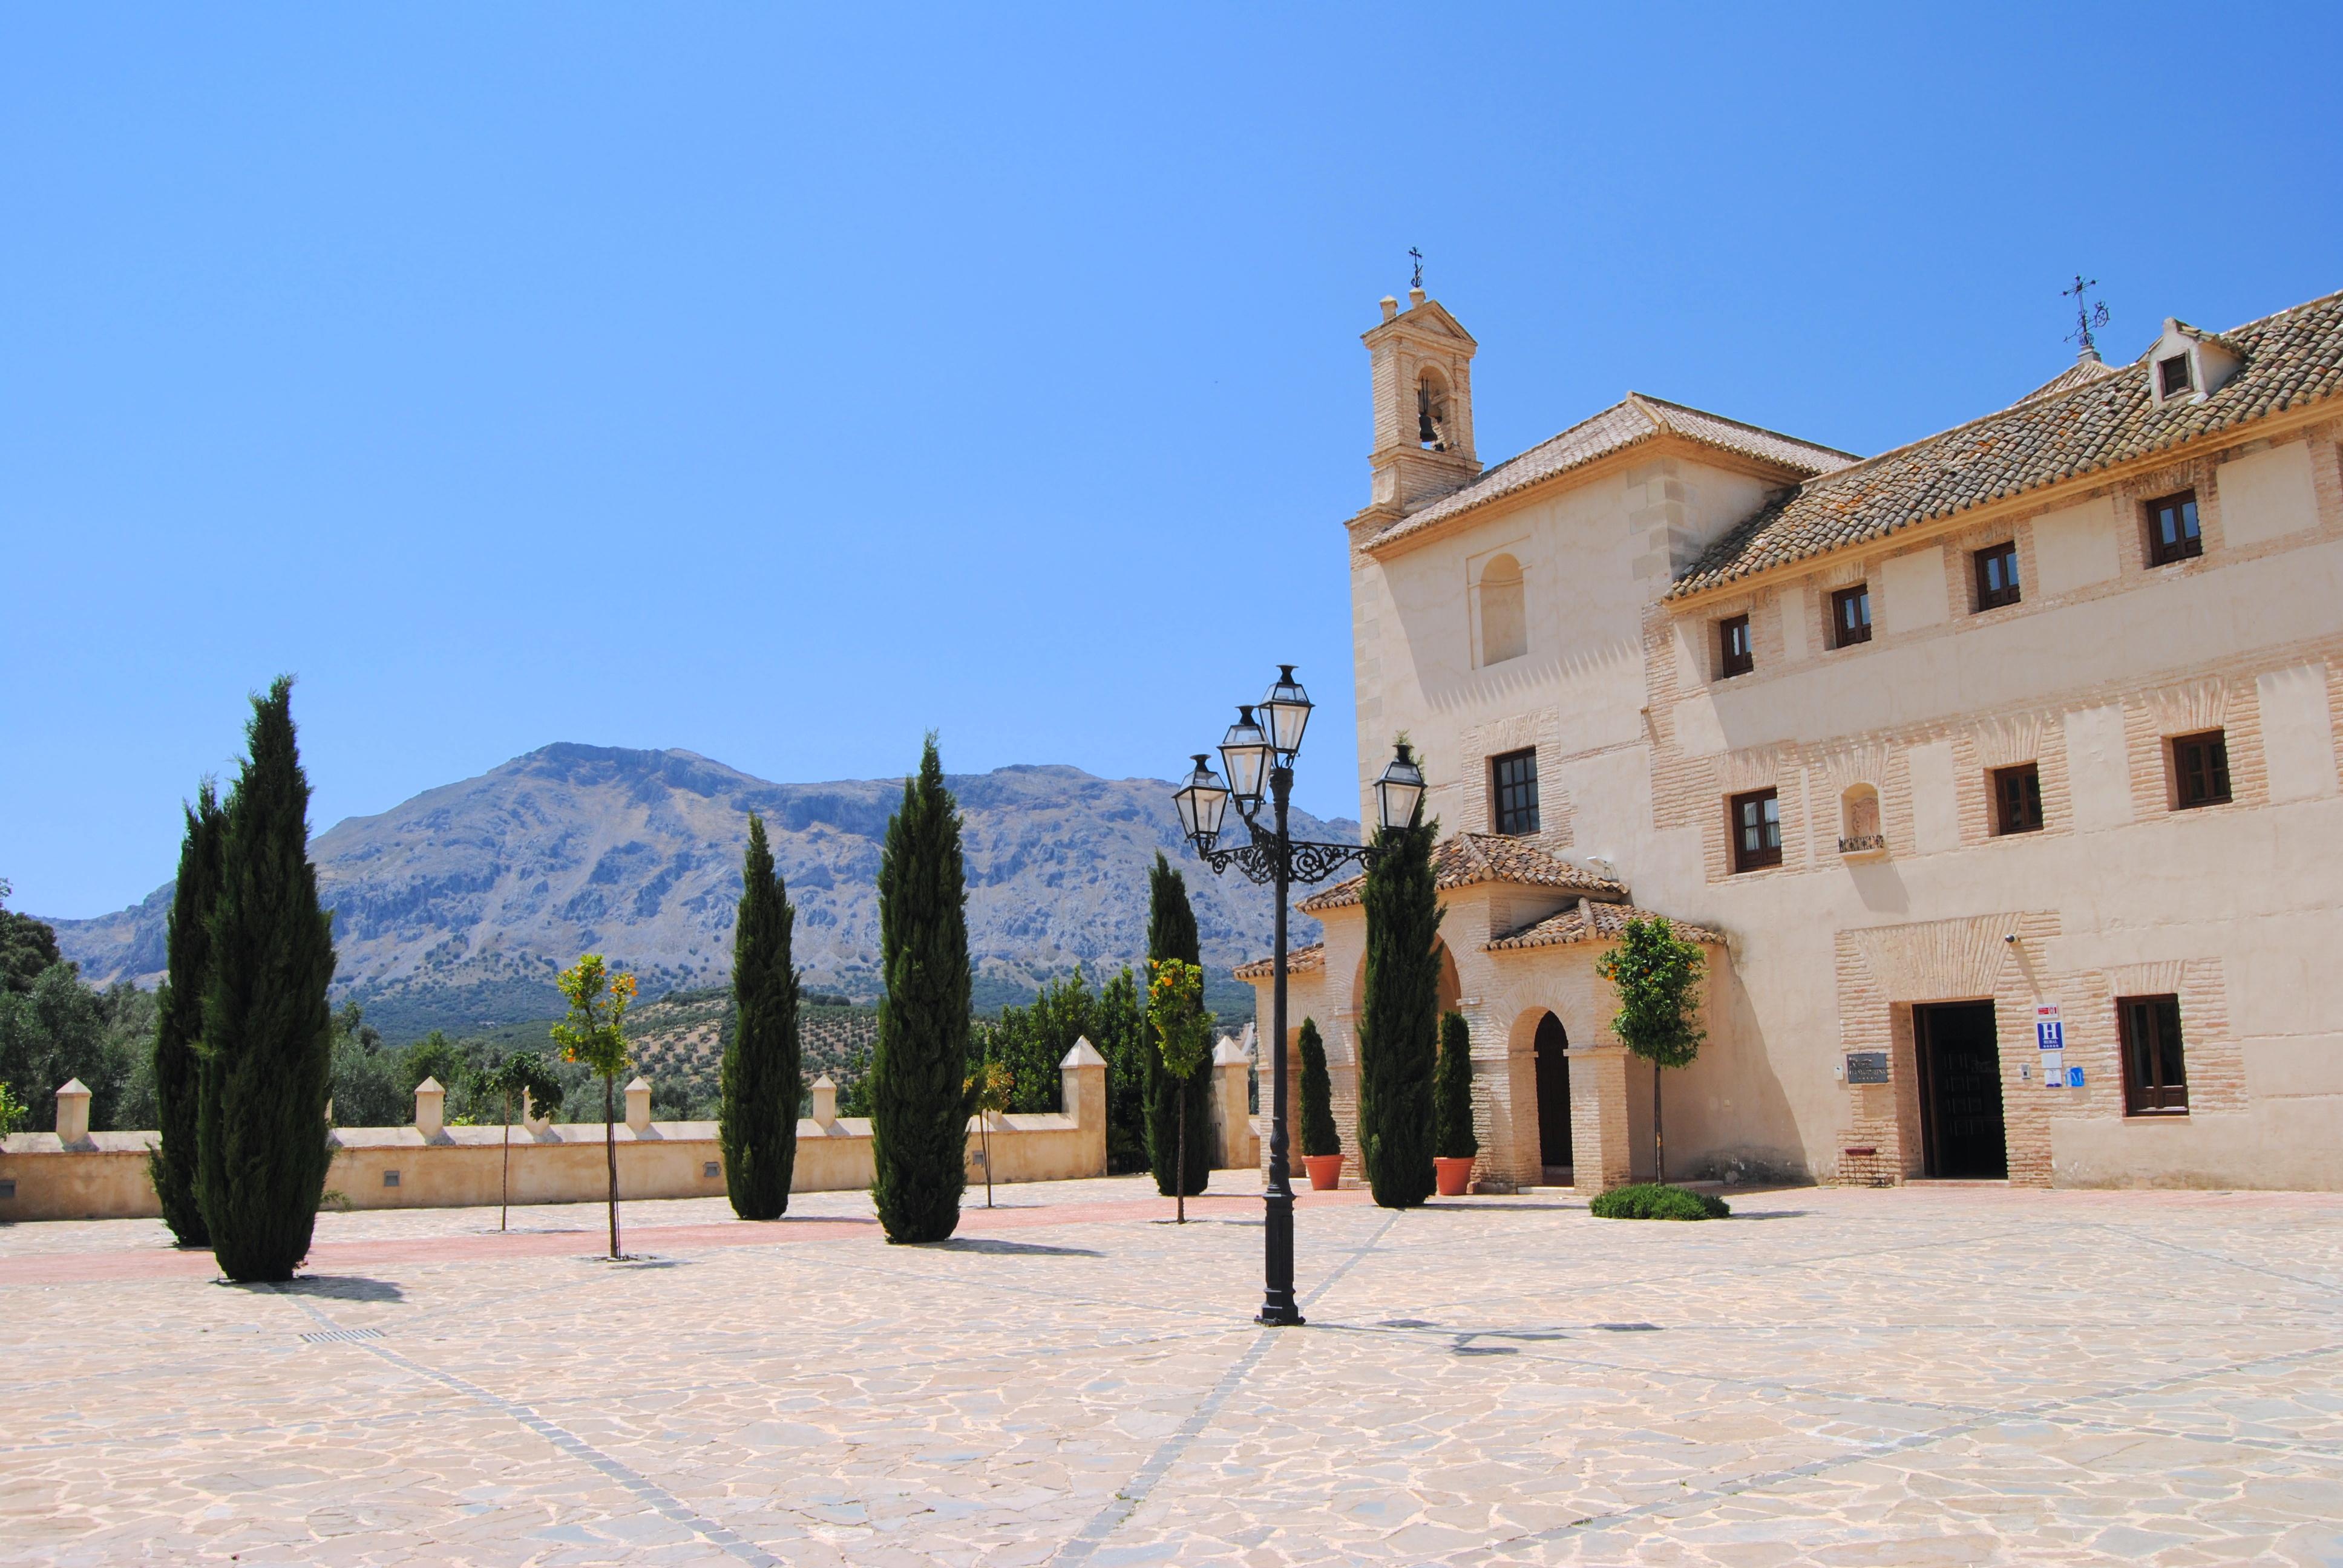 Charming hotels in malaga hotel convento la magdalena for Charming hotels